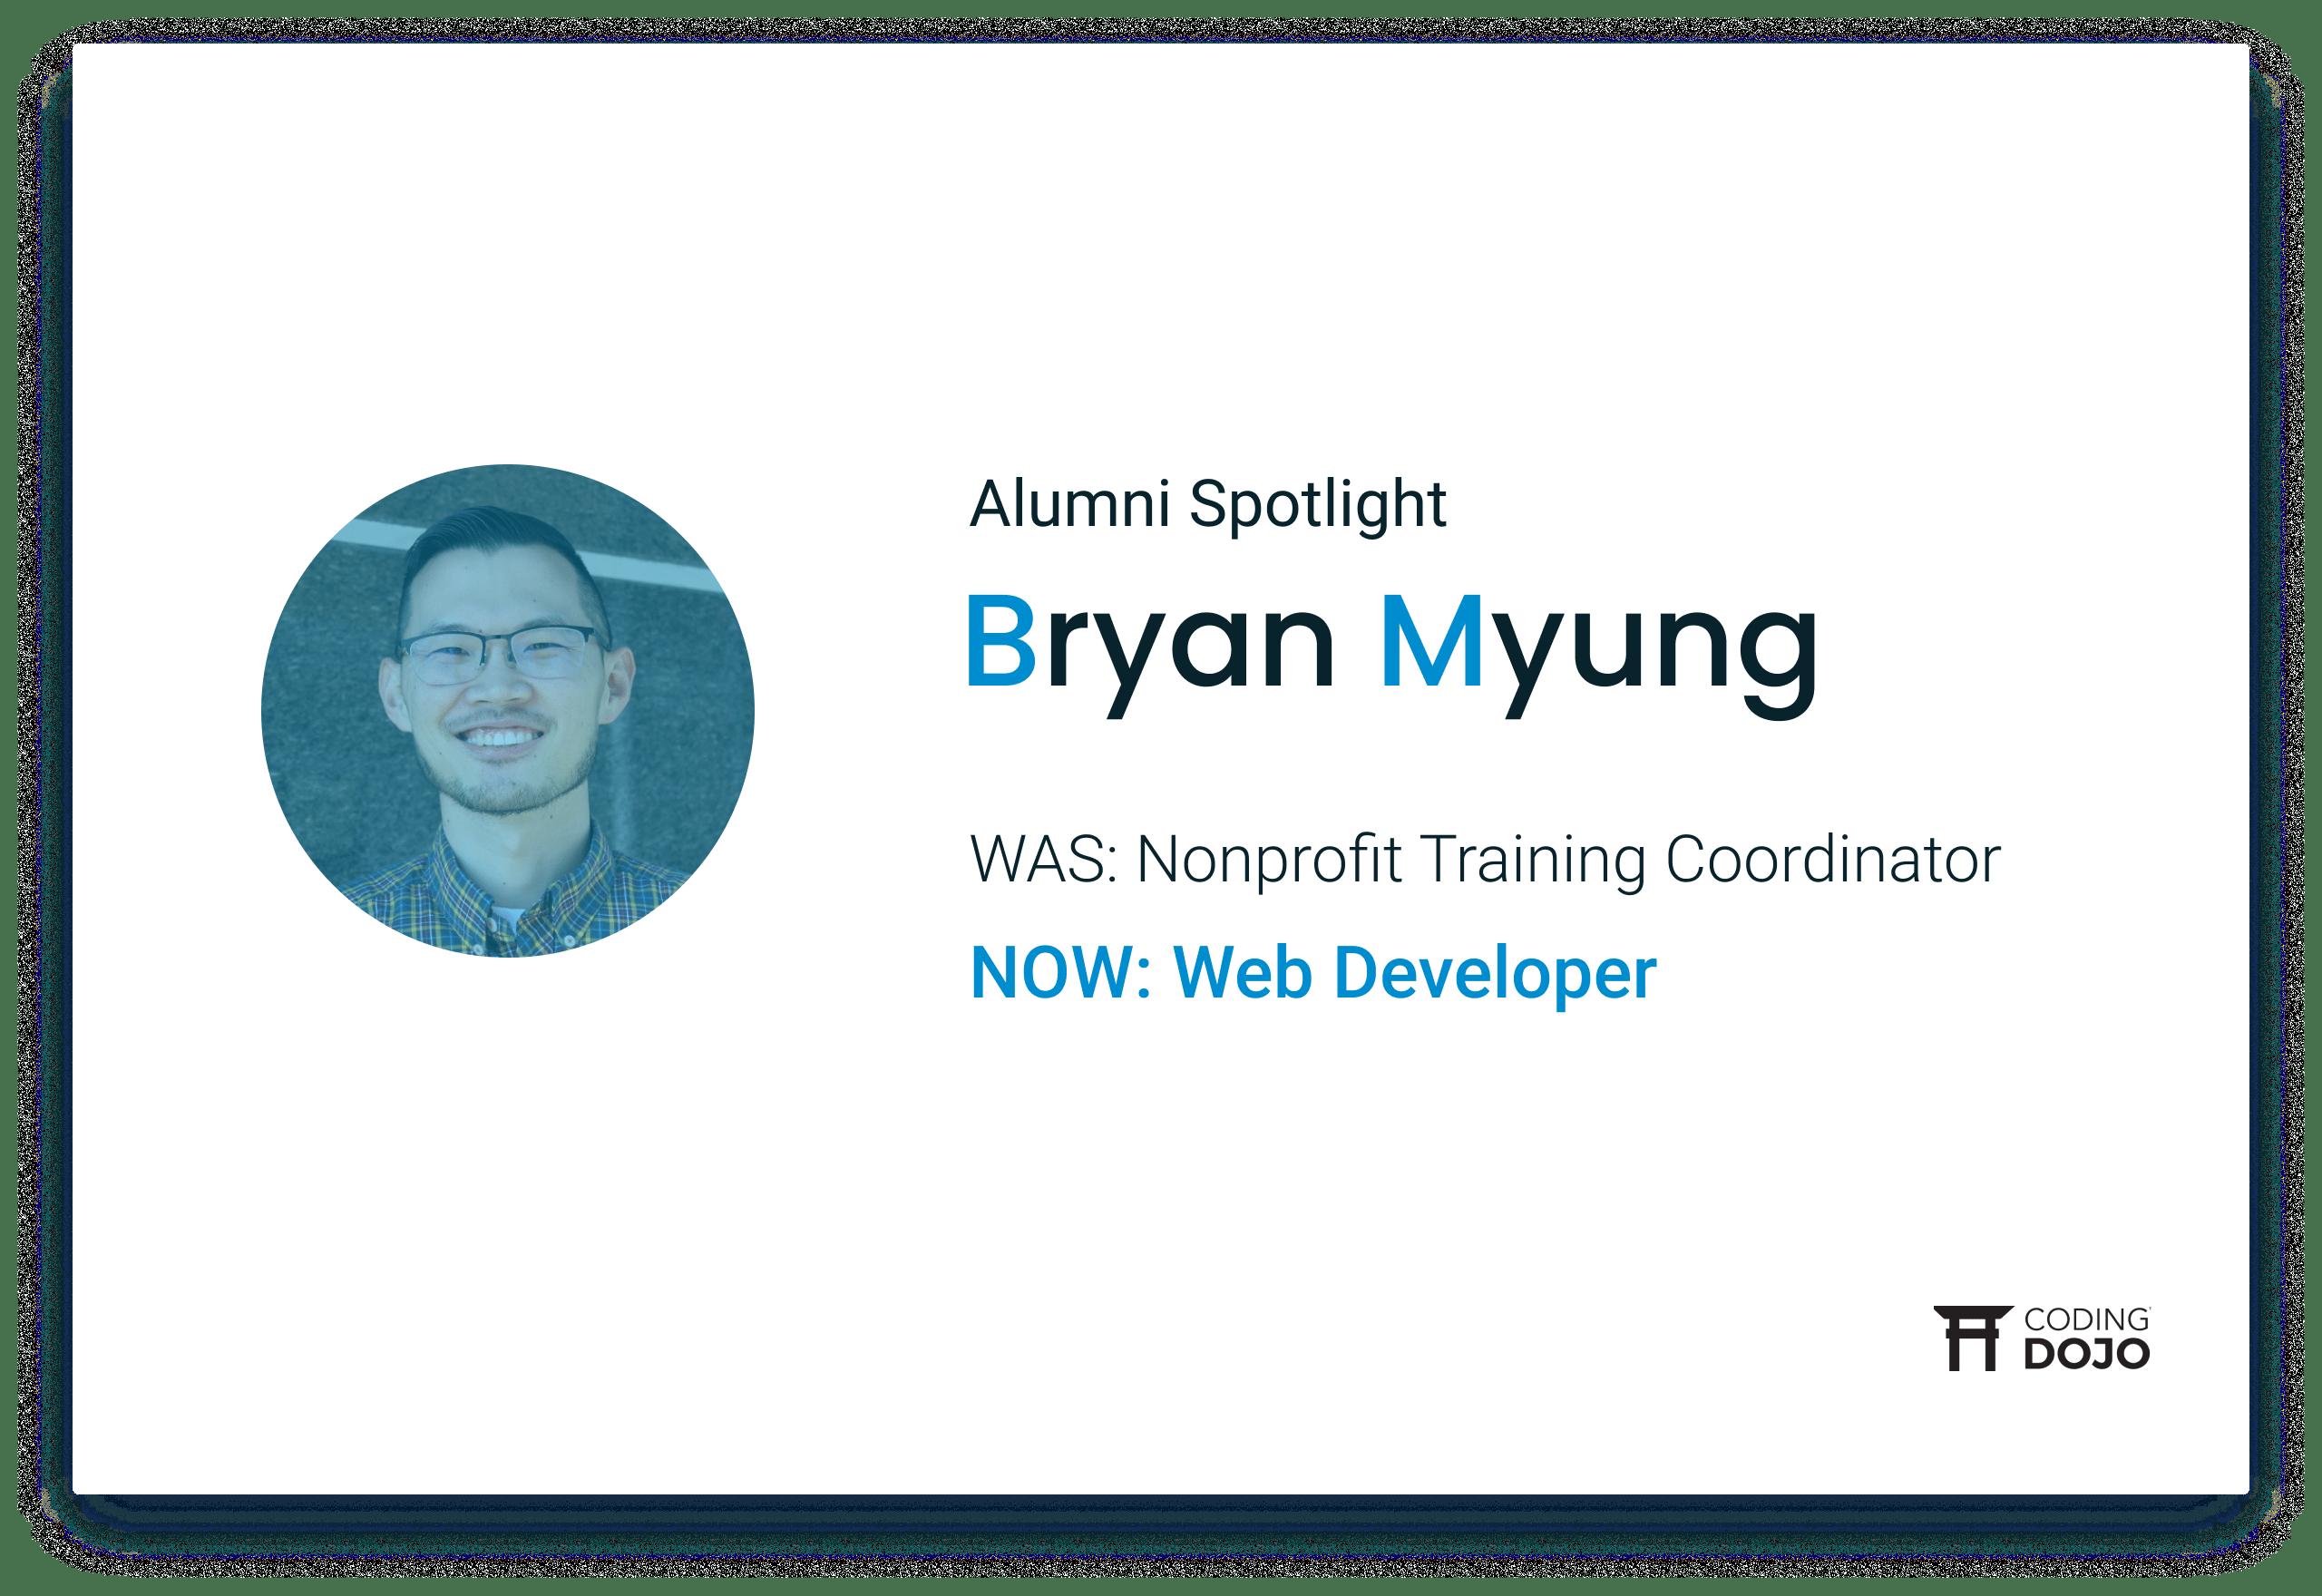 Coding Dojo Alumni Success | Bryan Myung